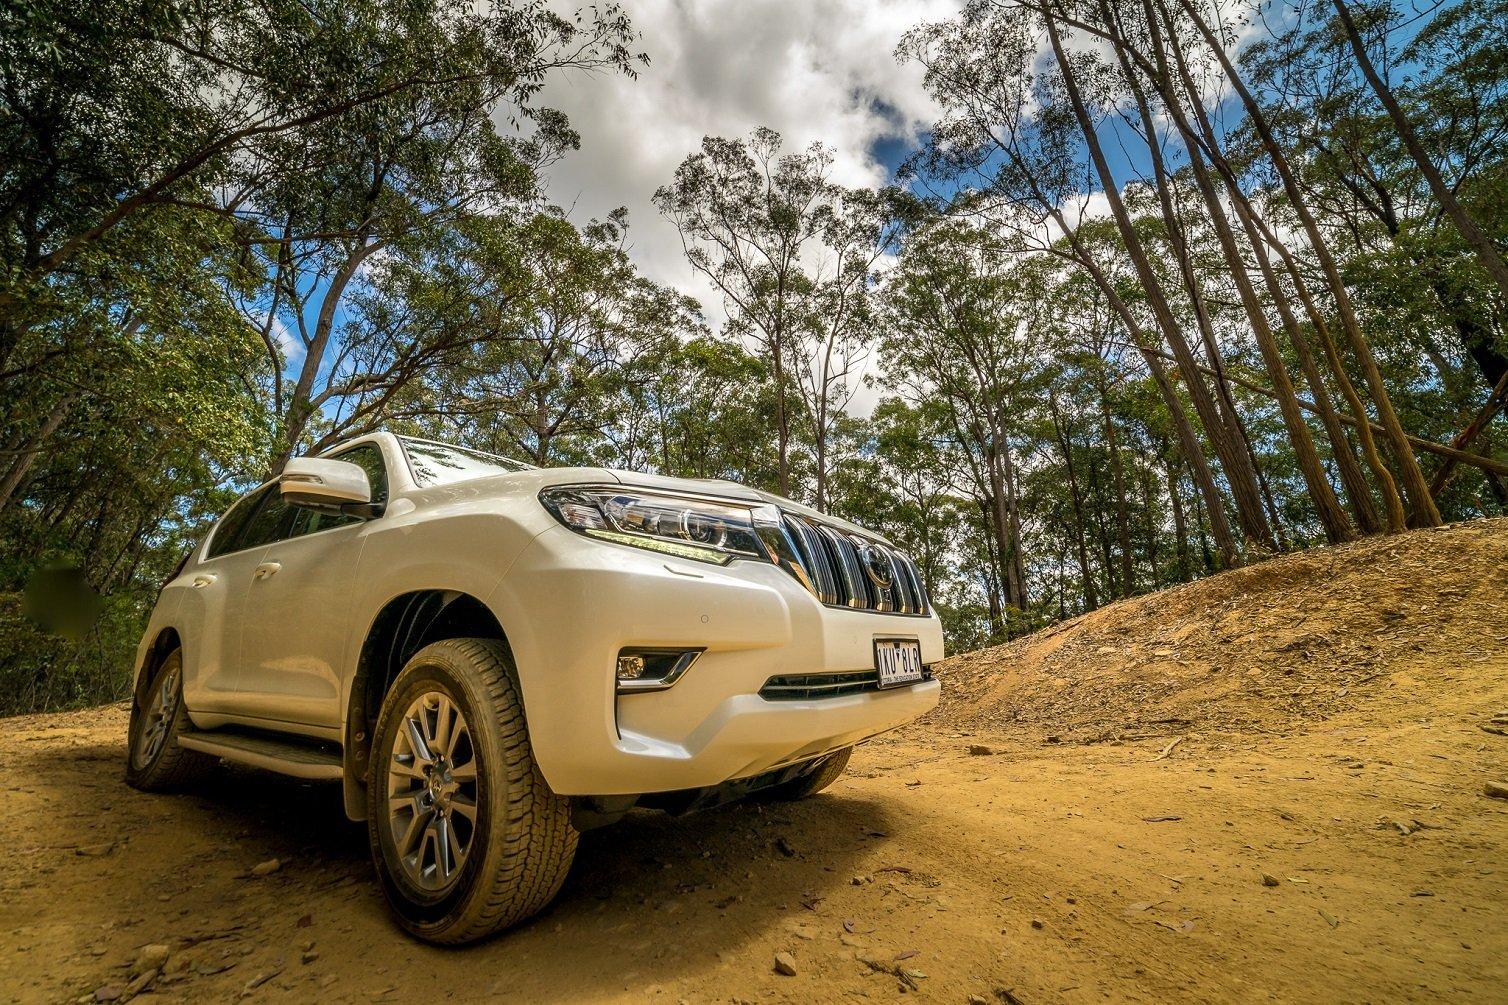 Auto Review: 2018 Toyota LandCruiser Prado Kakadu